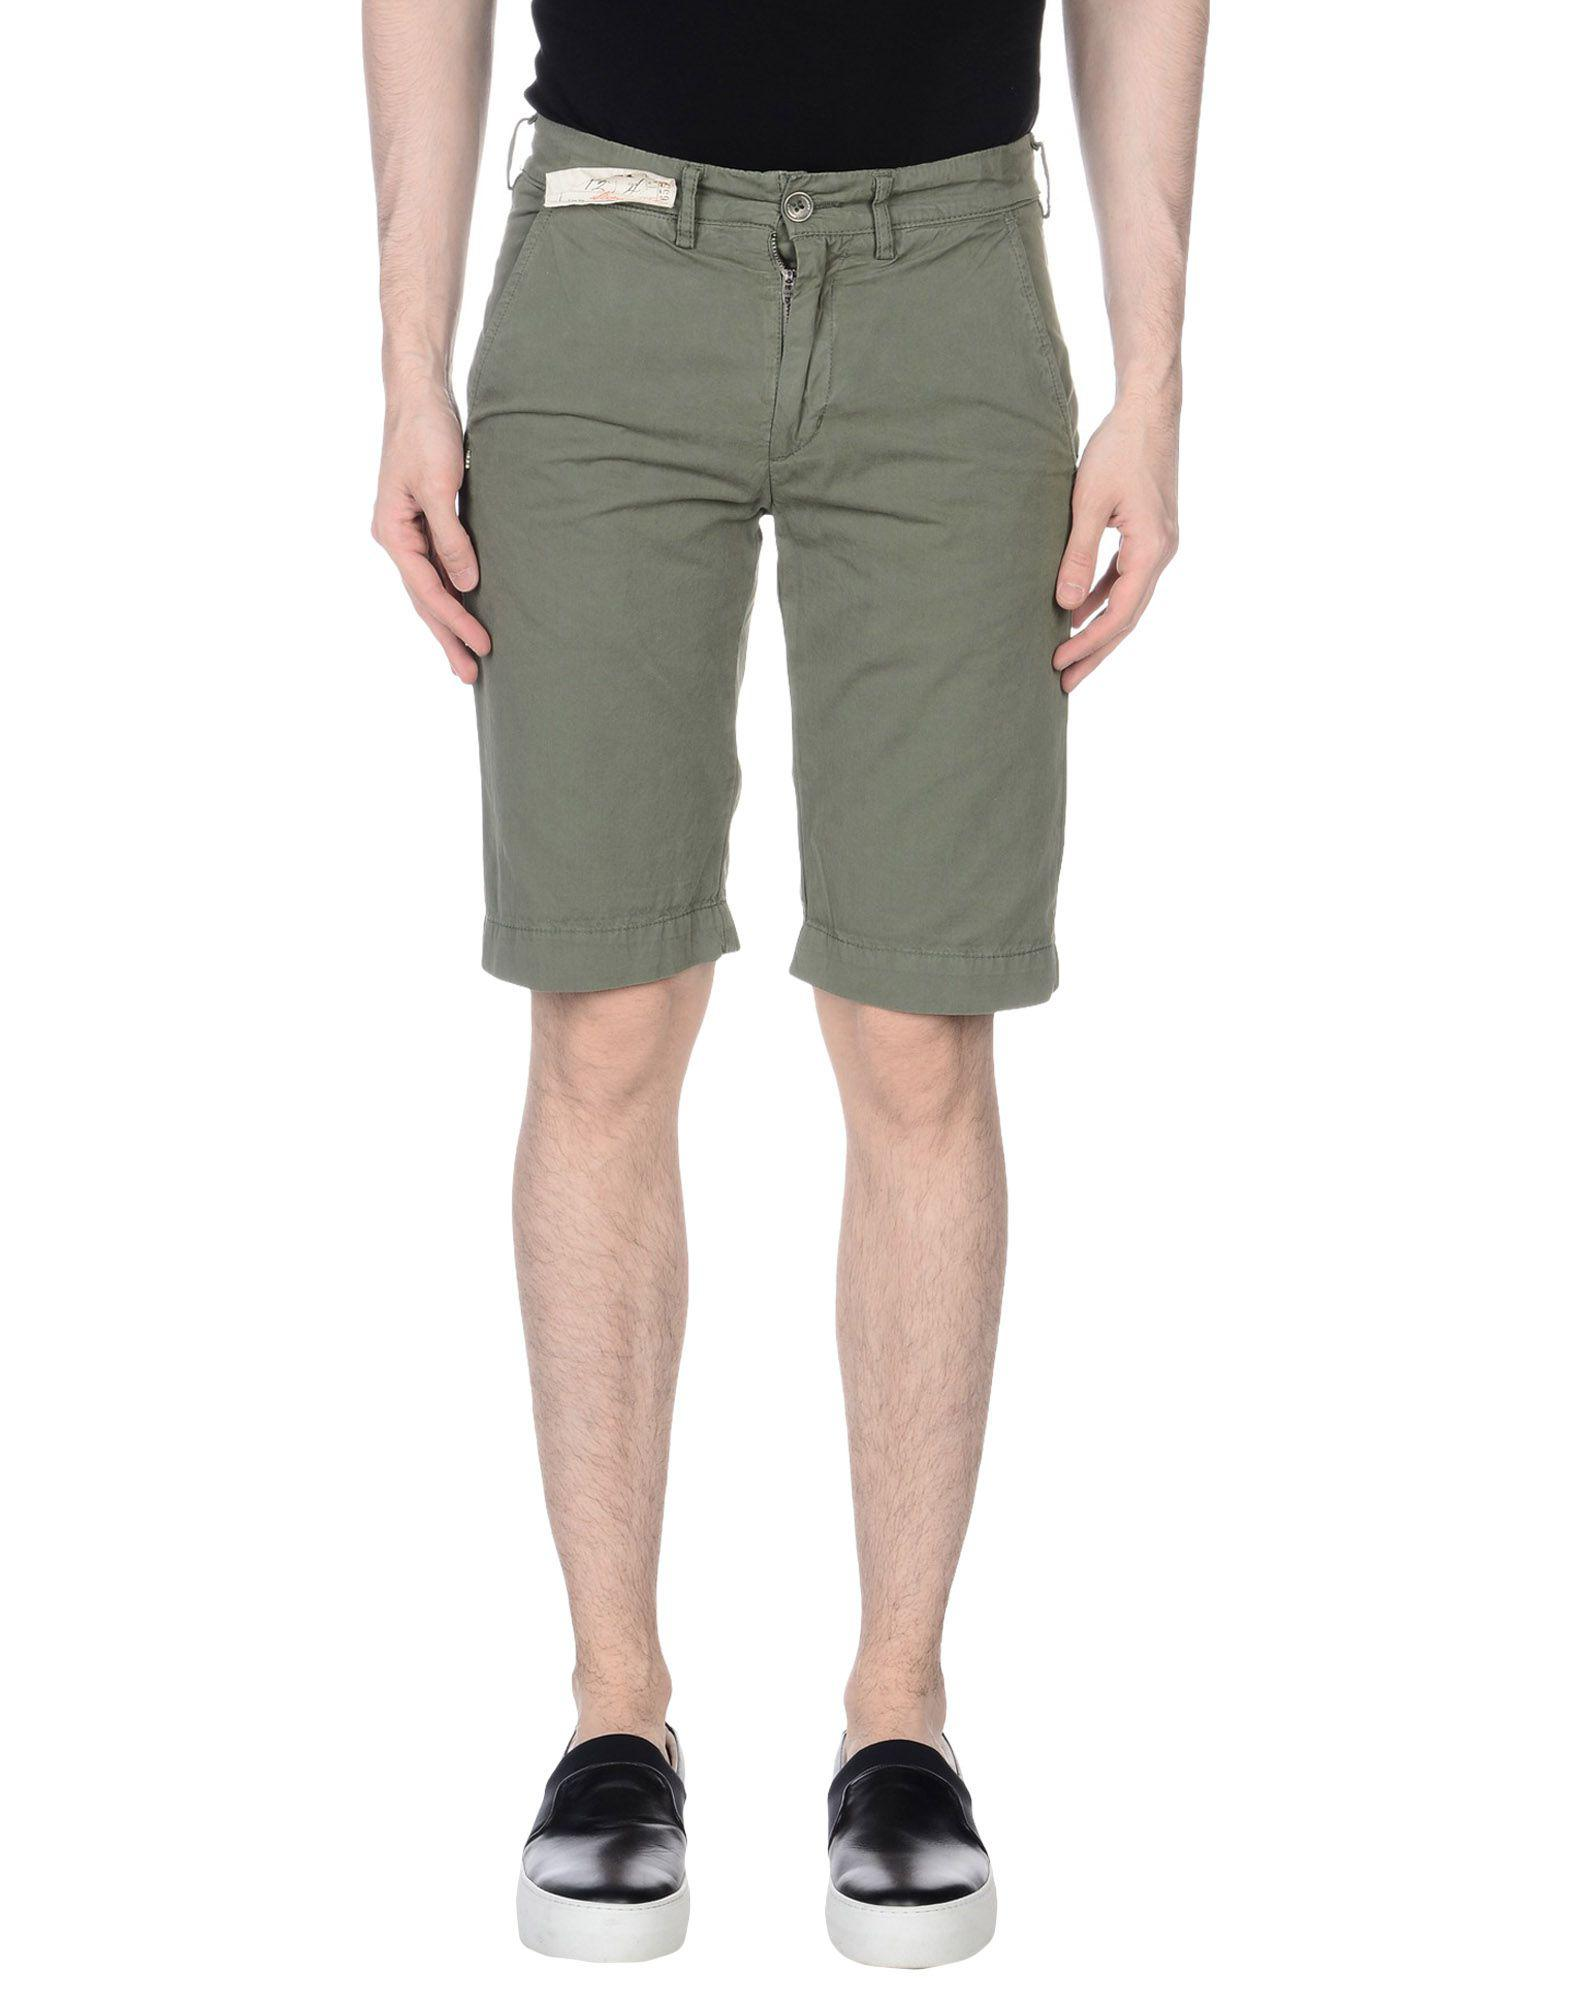 Pantalons - Bermudas 40weft bmhkBccoK